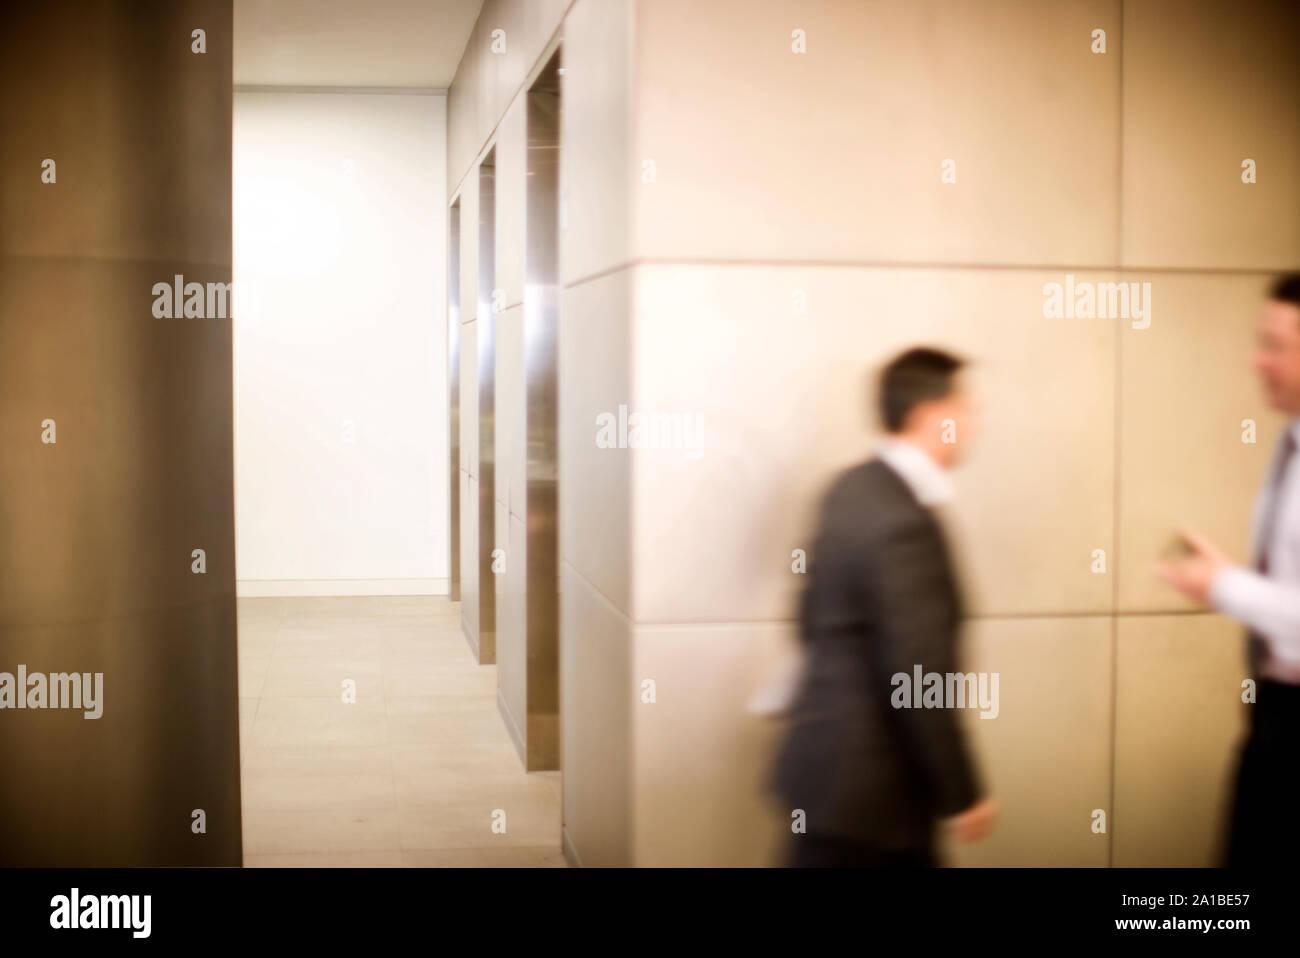 Businessmen walking by an elevator lobby. Stock Photo